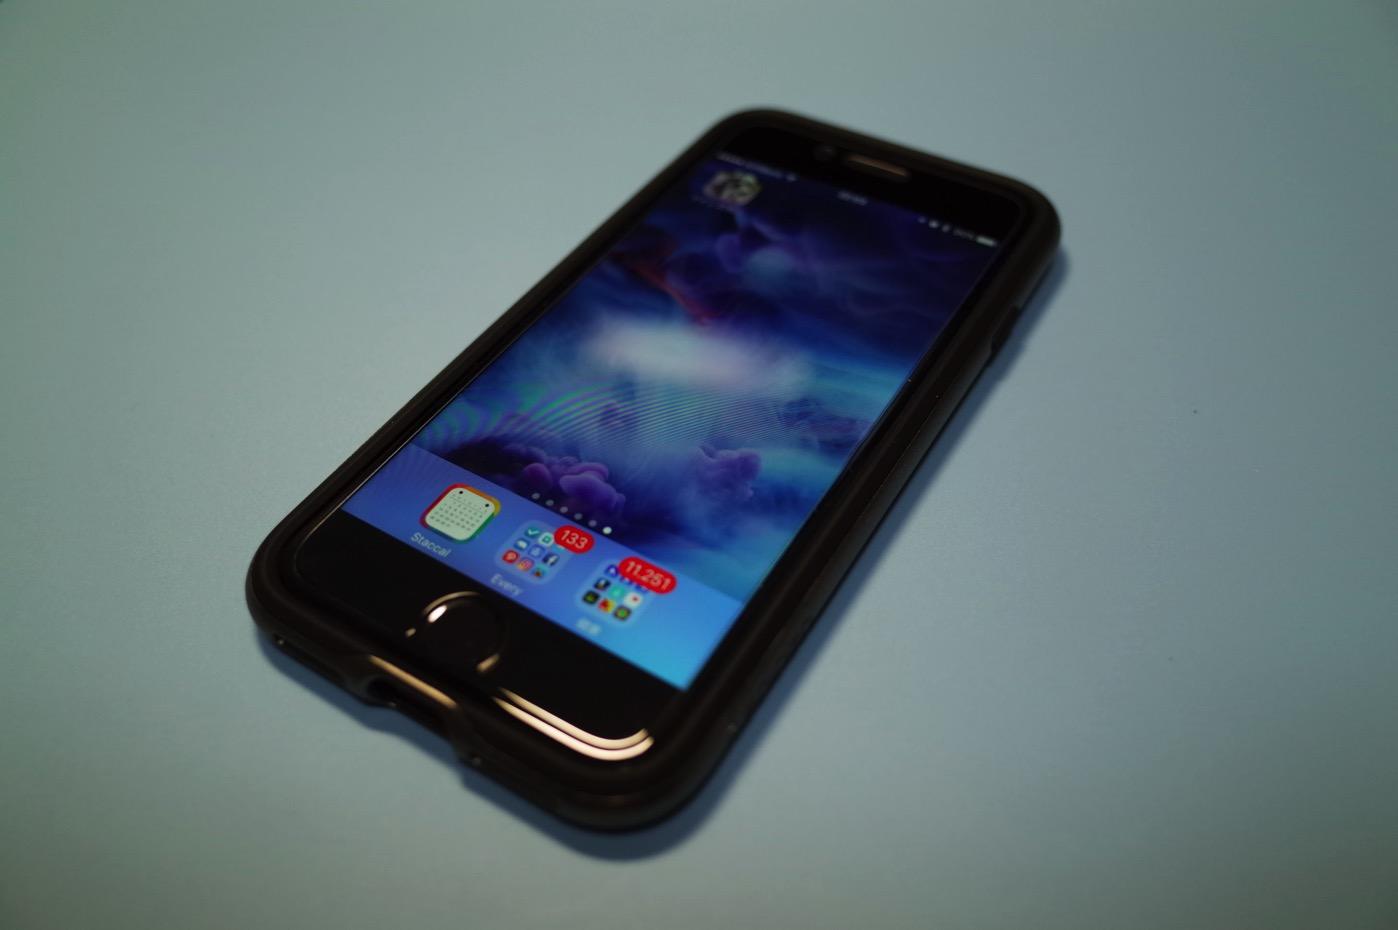 iPhoneケース「ネオ・ハイブリッド米軍MIL規格取得 二重構造バンパー」-11